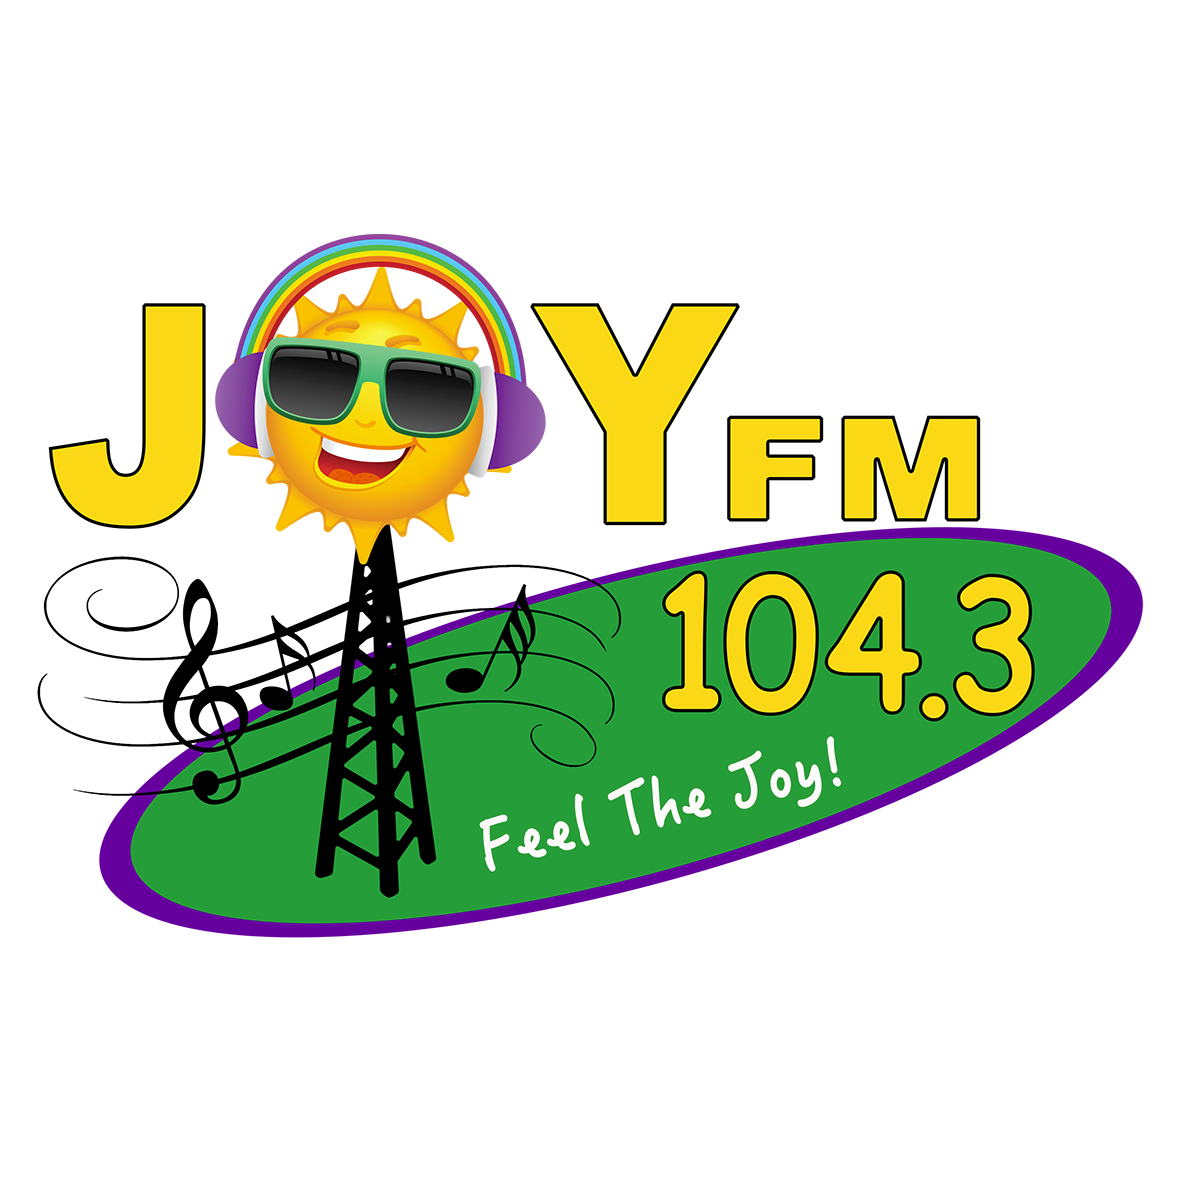 1043JOYFM